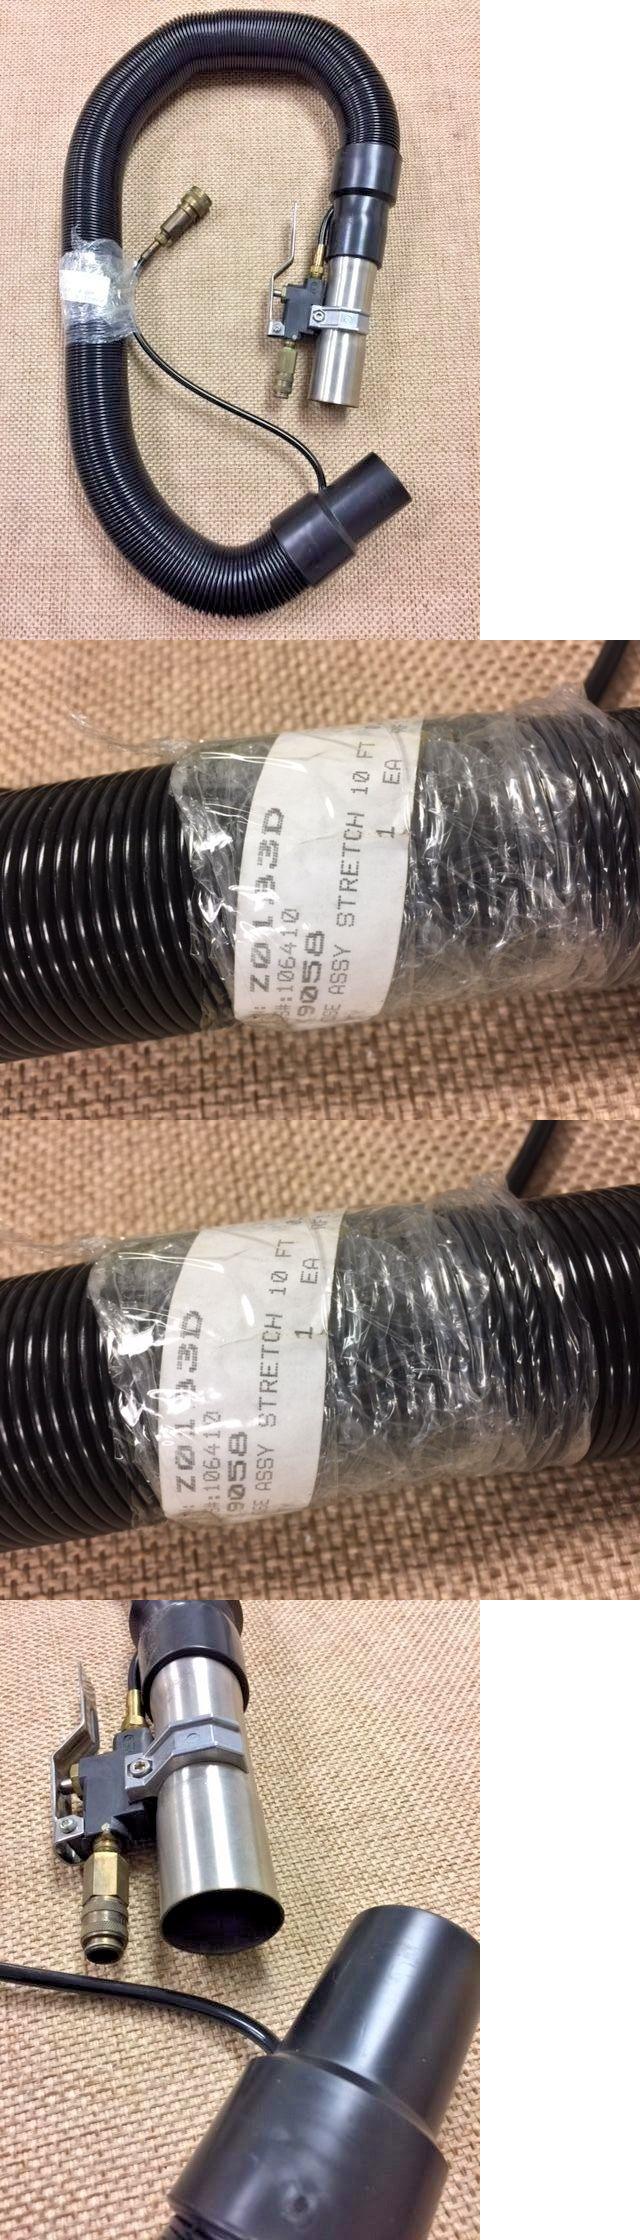 Only stretch hose